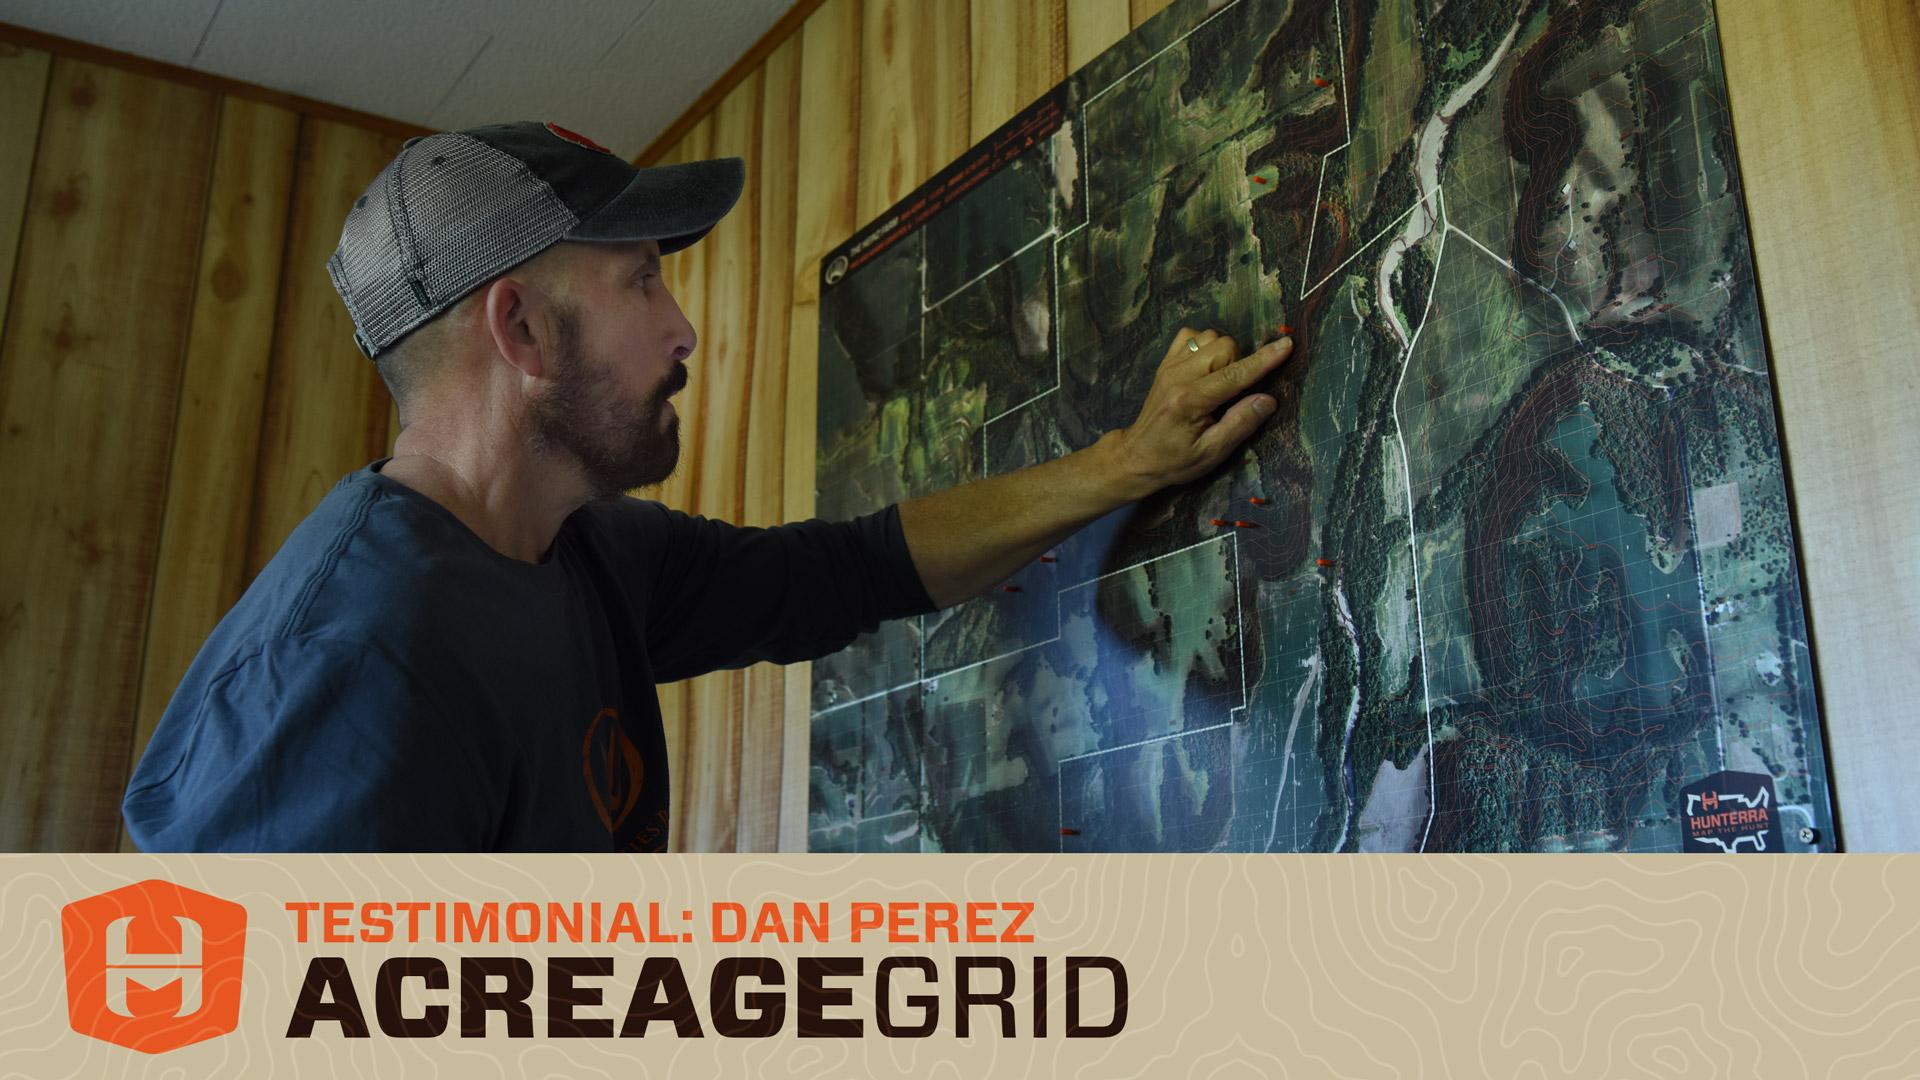 Acreage Grid